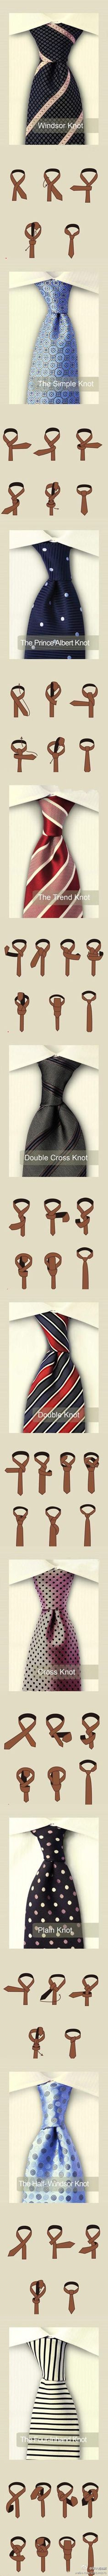 Infografía útil: resolviendo el misterio del nudo de la corbata